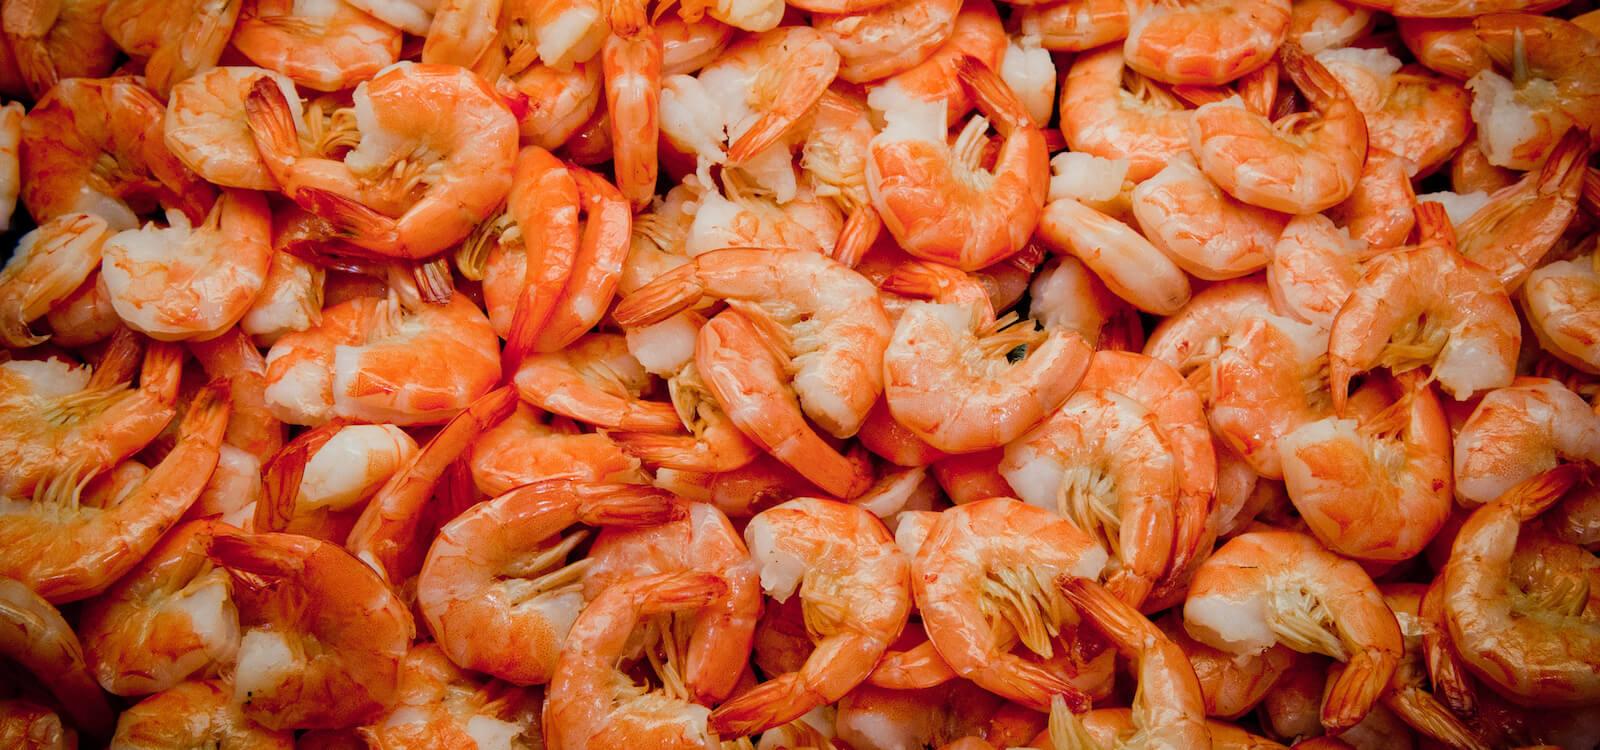 MustDo.com | Sweet pink Gulf shrimp Fort Myers, Florida. Photo by Debi Pittman Wilkey.